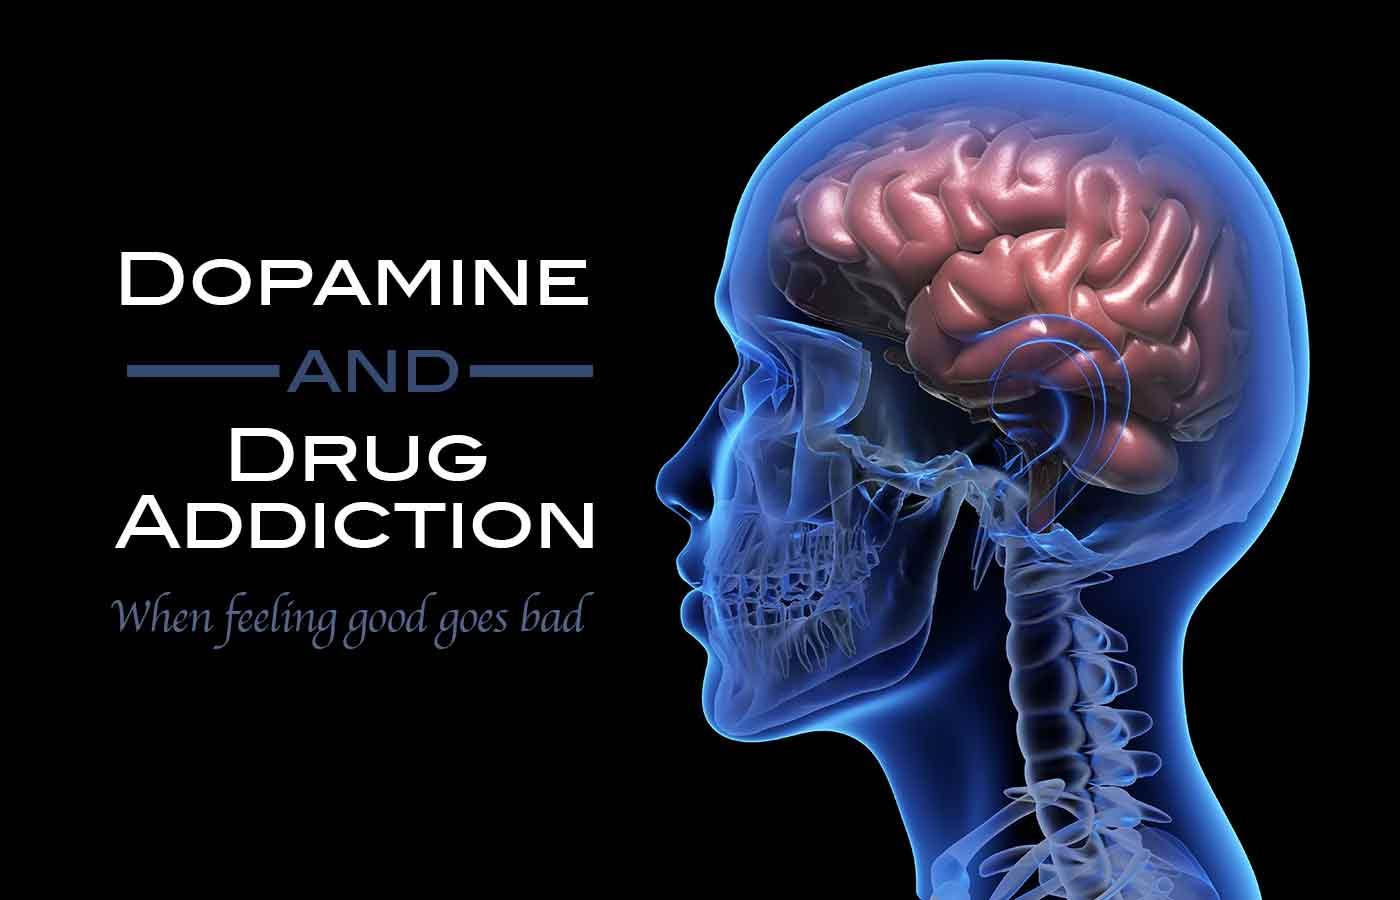 Dopamine and Drug Addiction